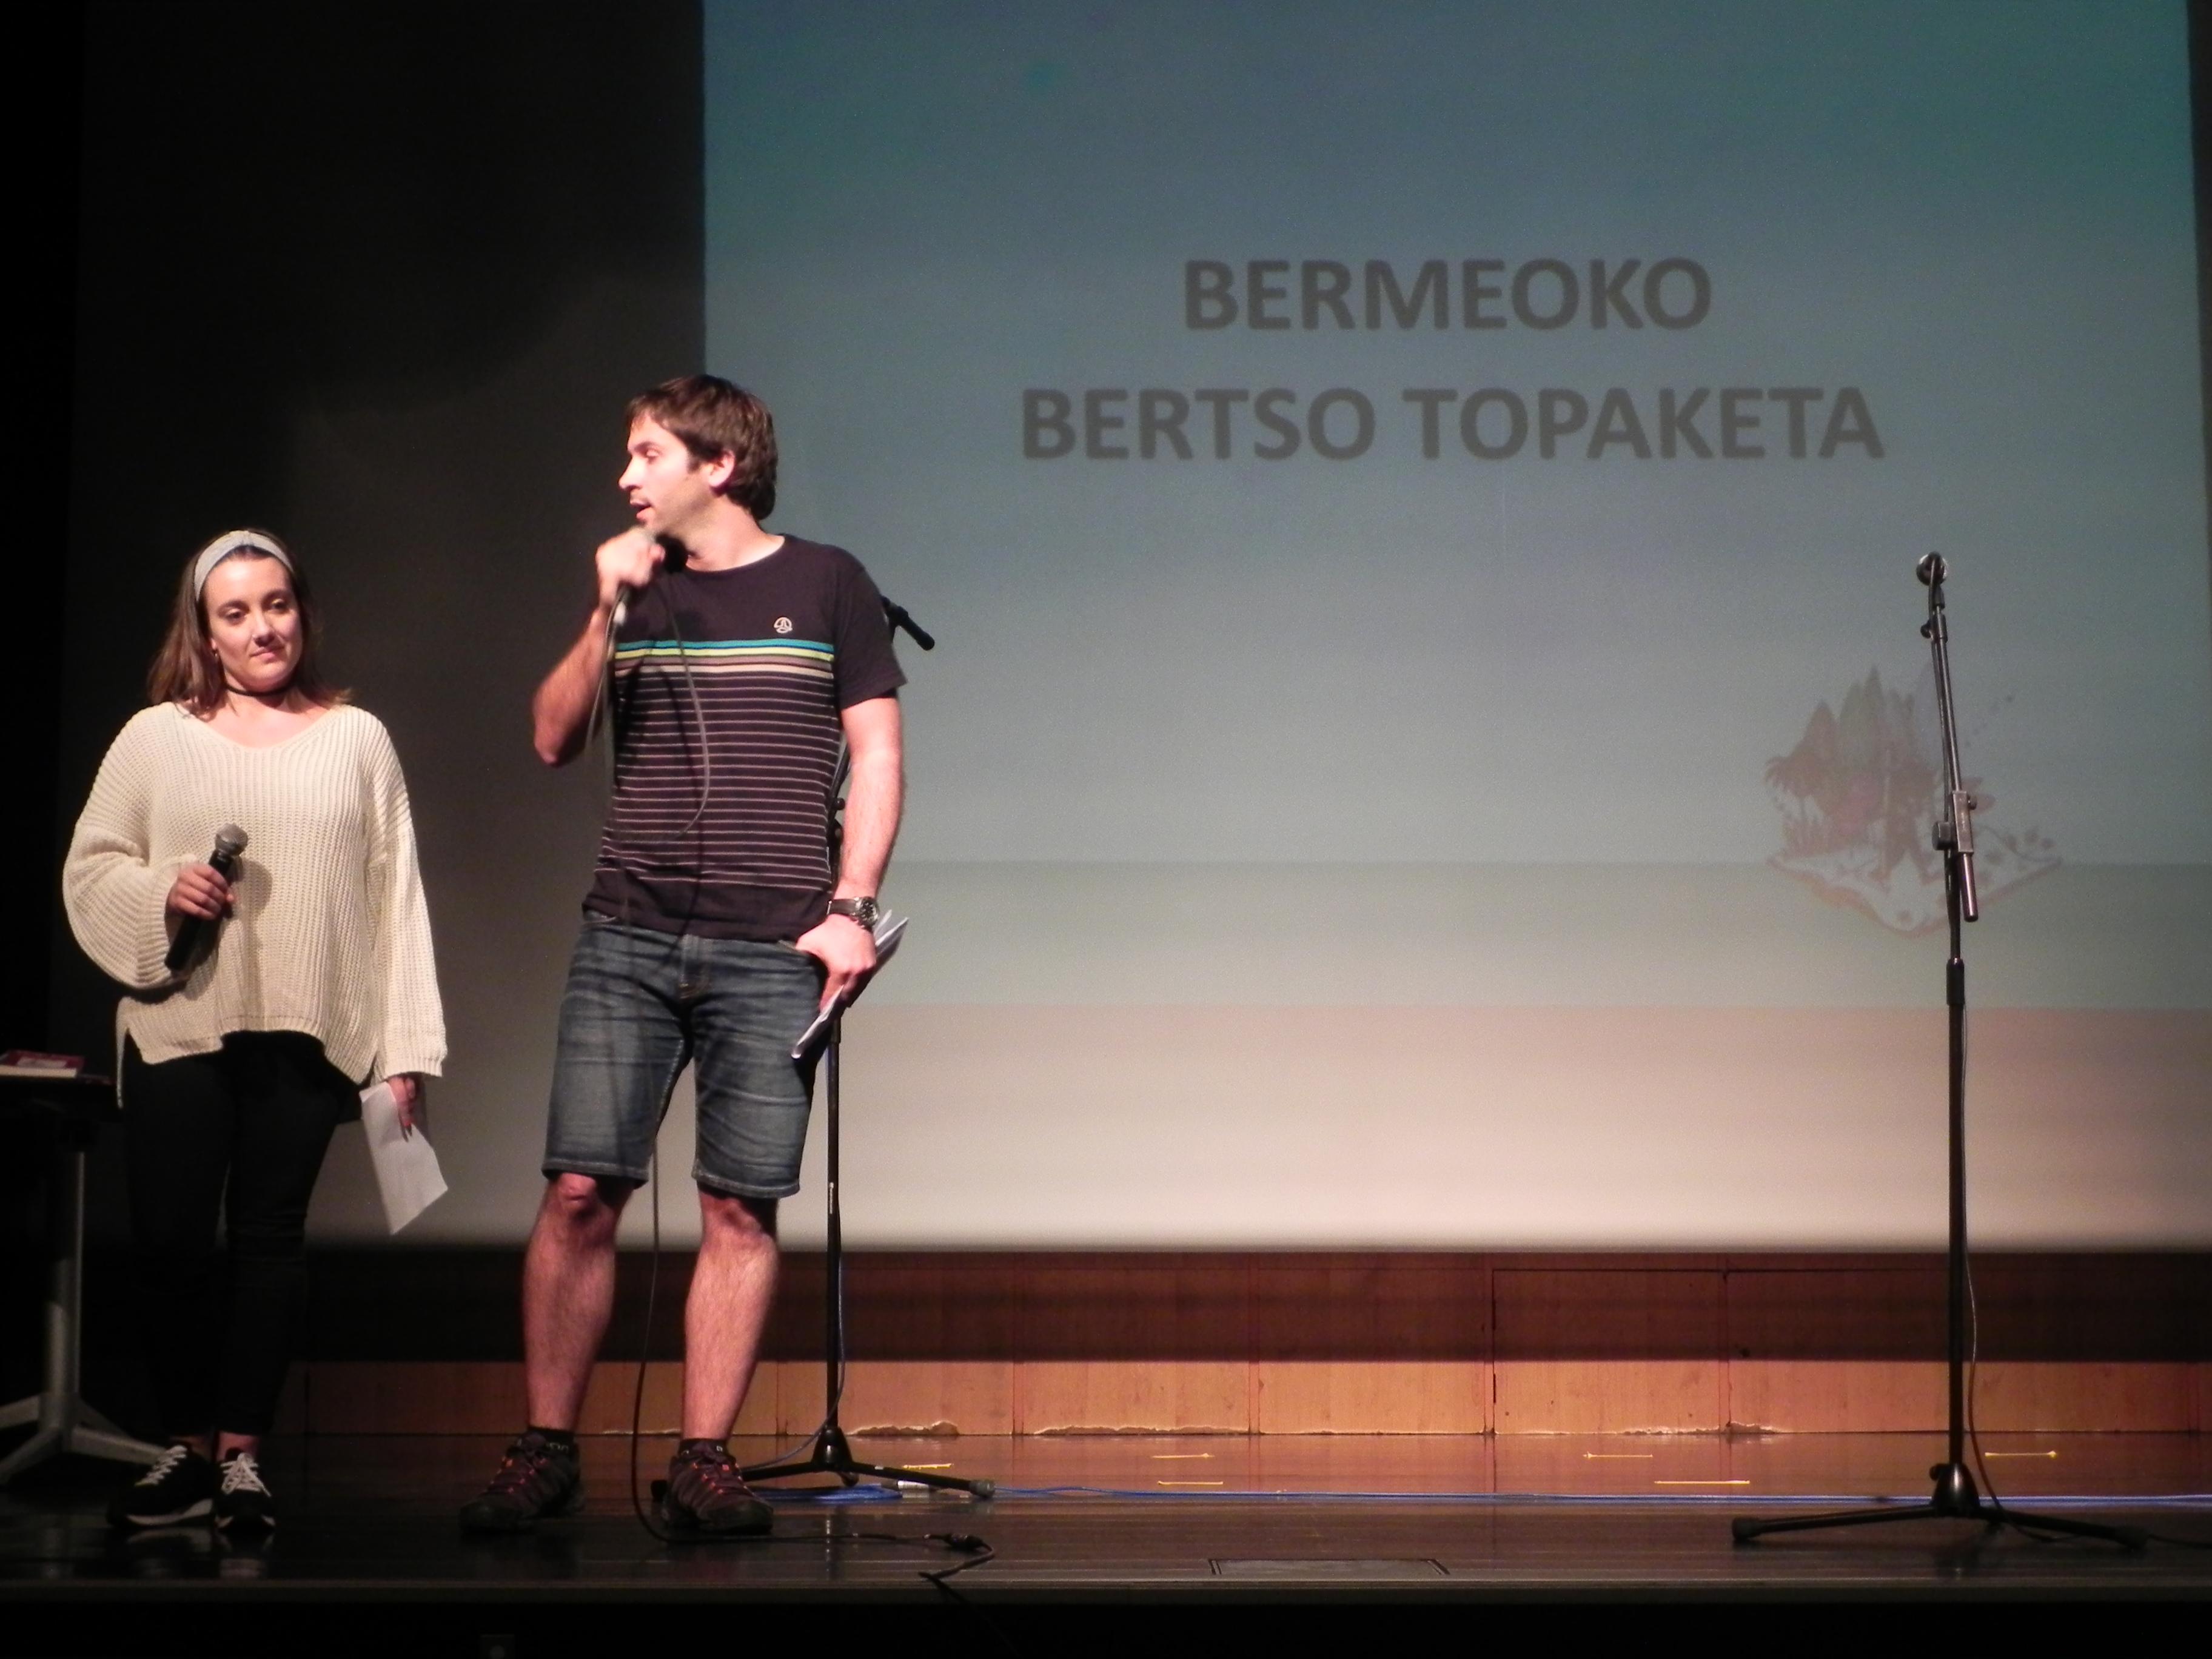 2017 05 25 Bermeo DSCN7873